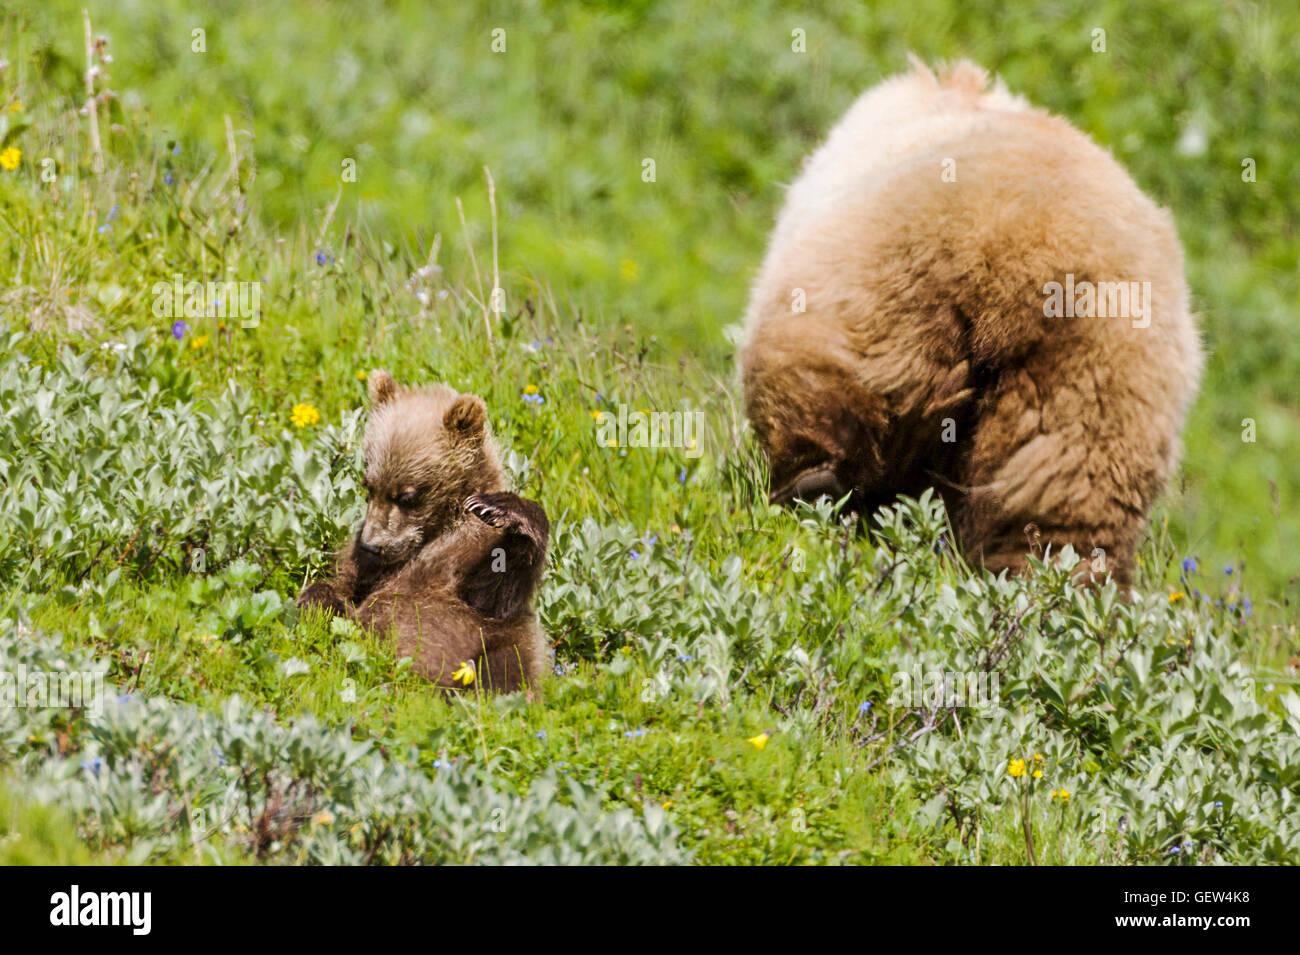 Seminare (femmina) Orso grizzly (Ursus arctos horribilis) con i cuccioli, vicino autostrada Pass, Parco Nazionale Immagini Stock